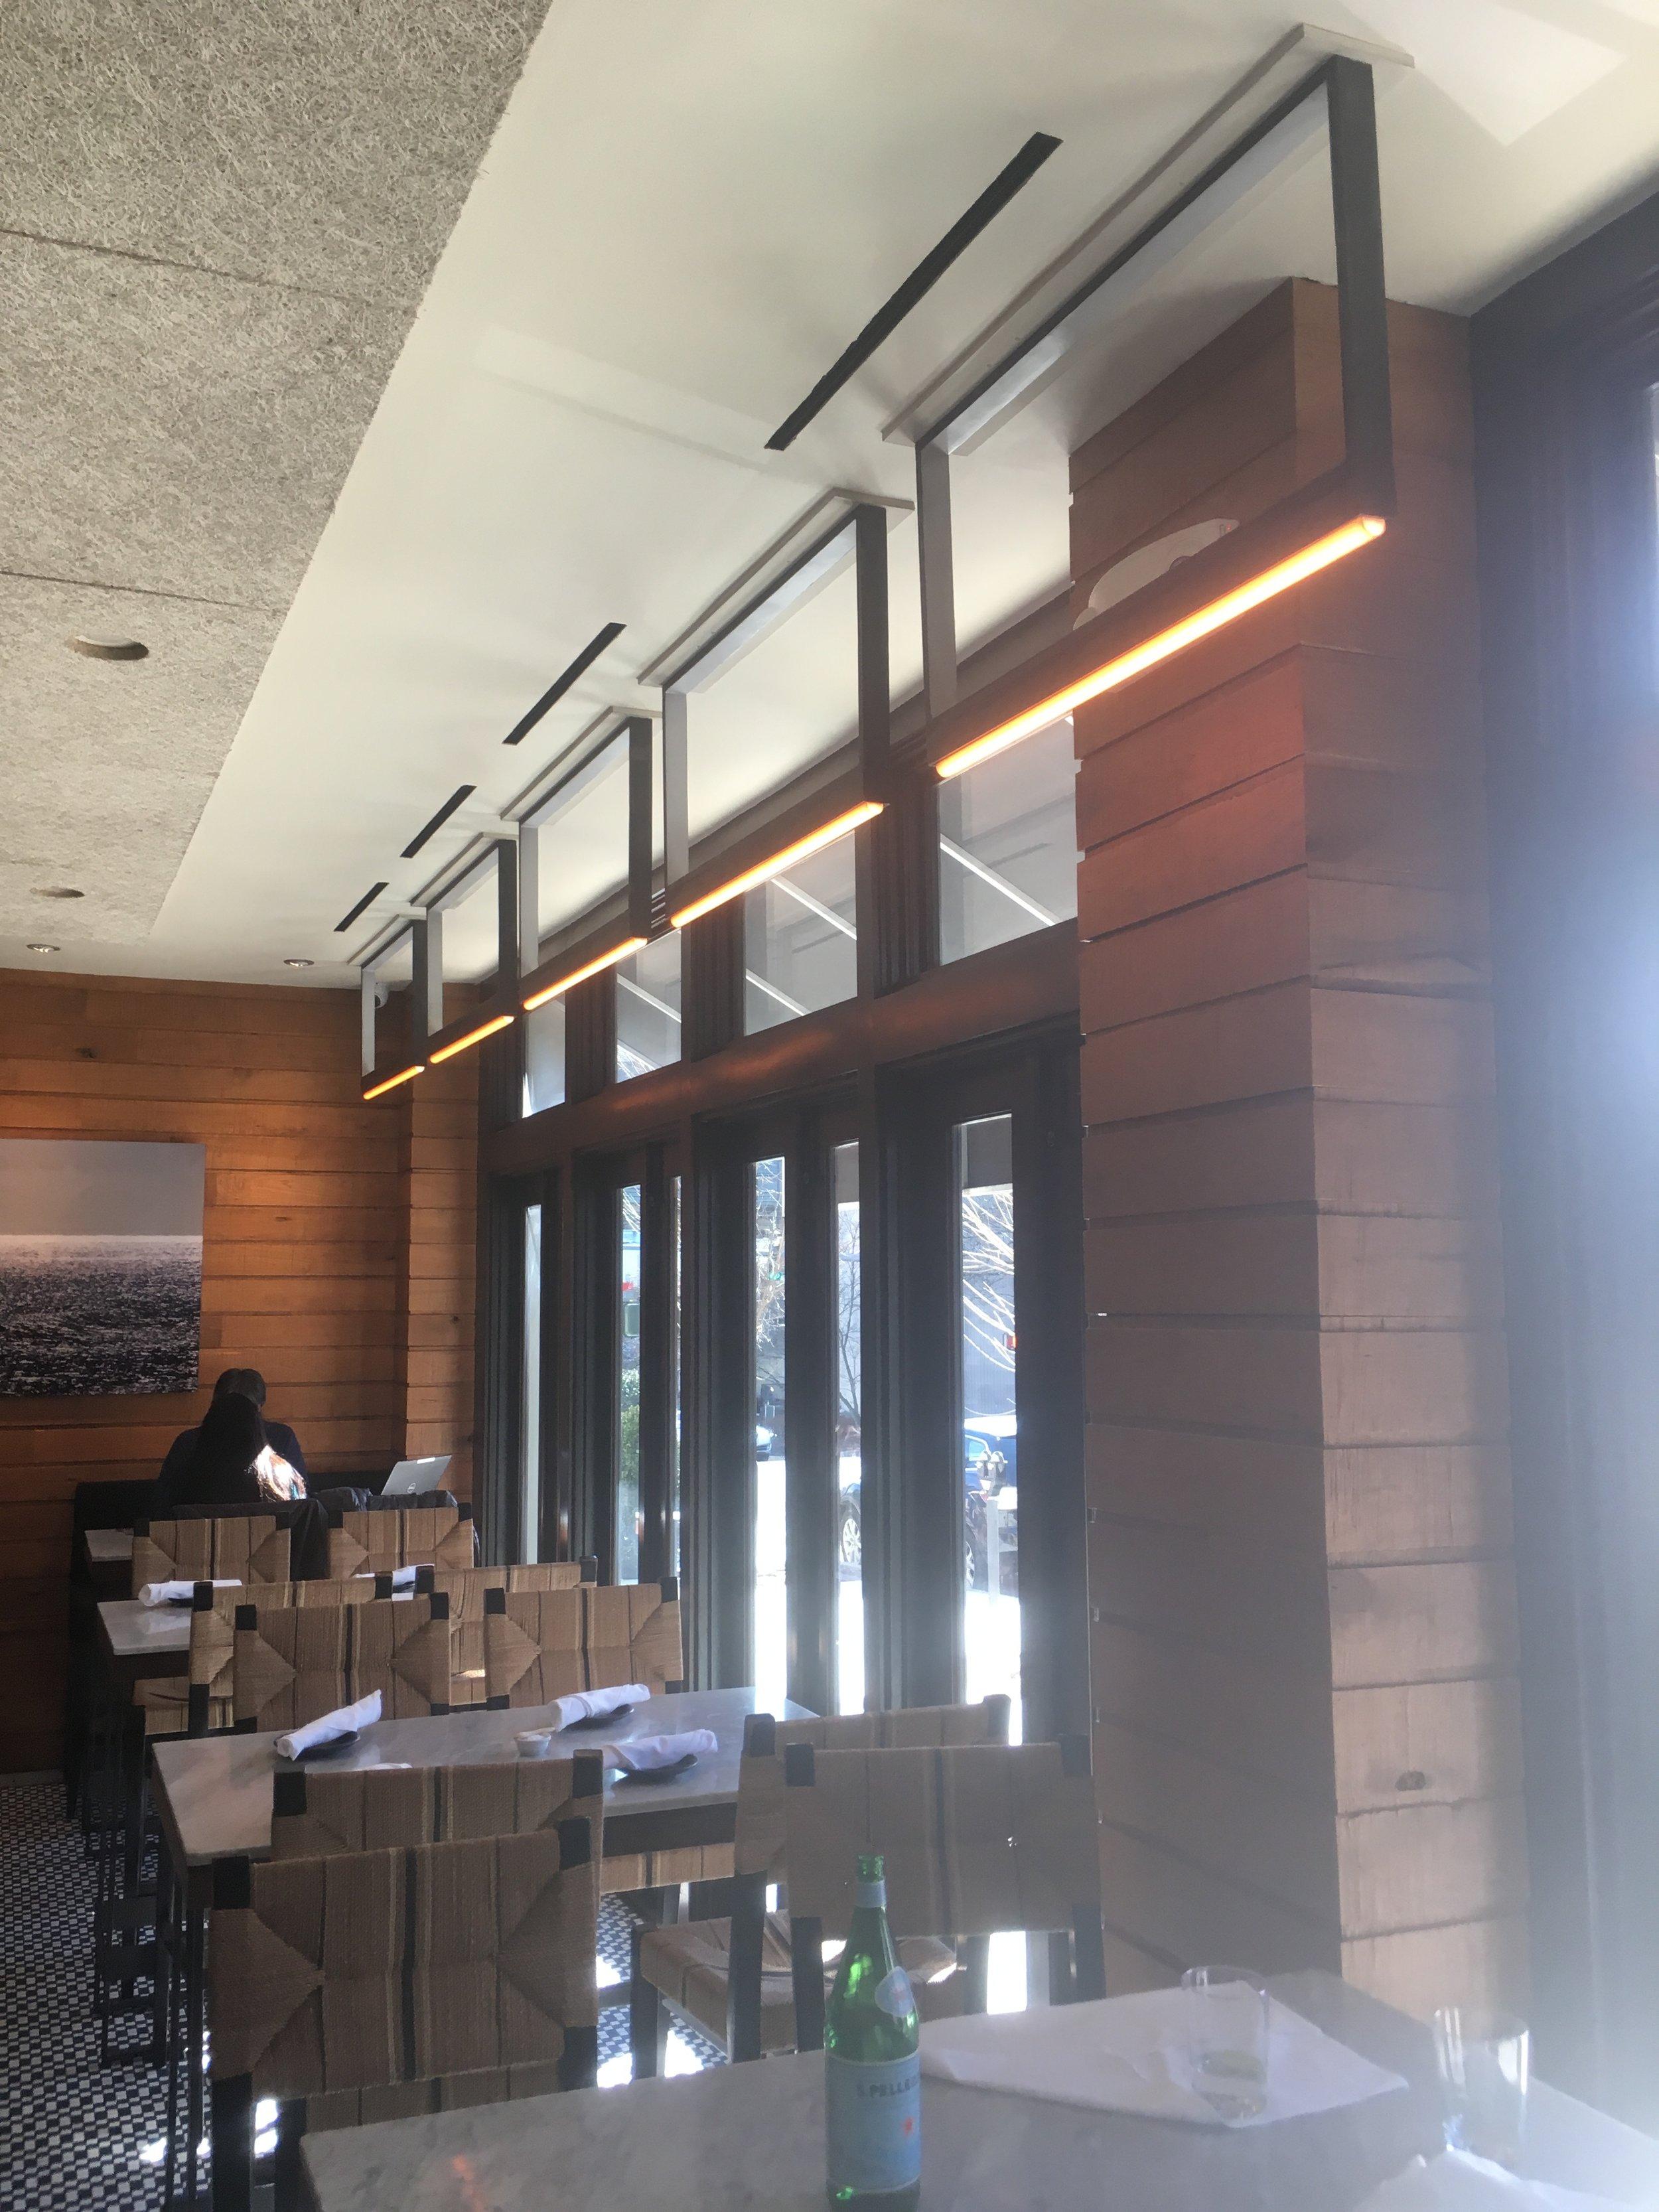 East/End Restaurant, Greenwich CT